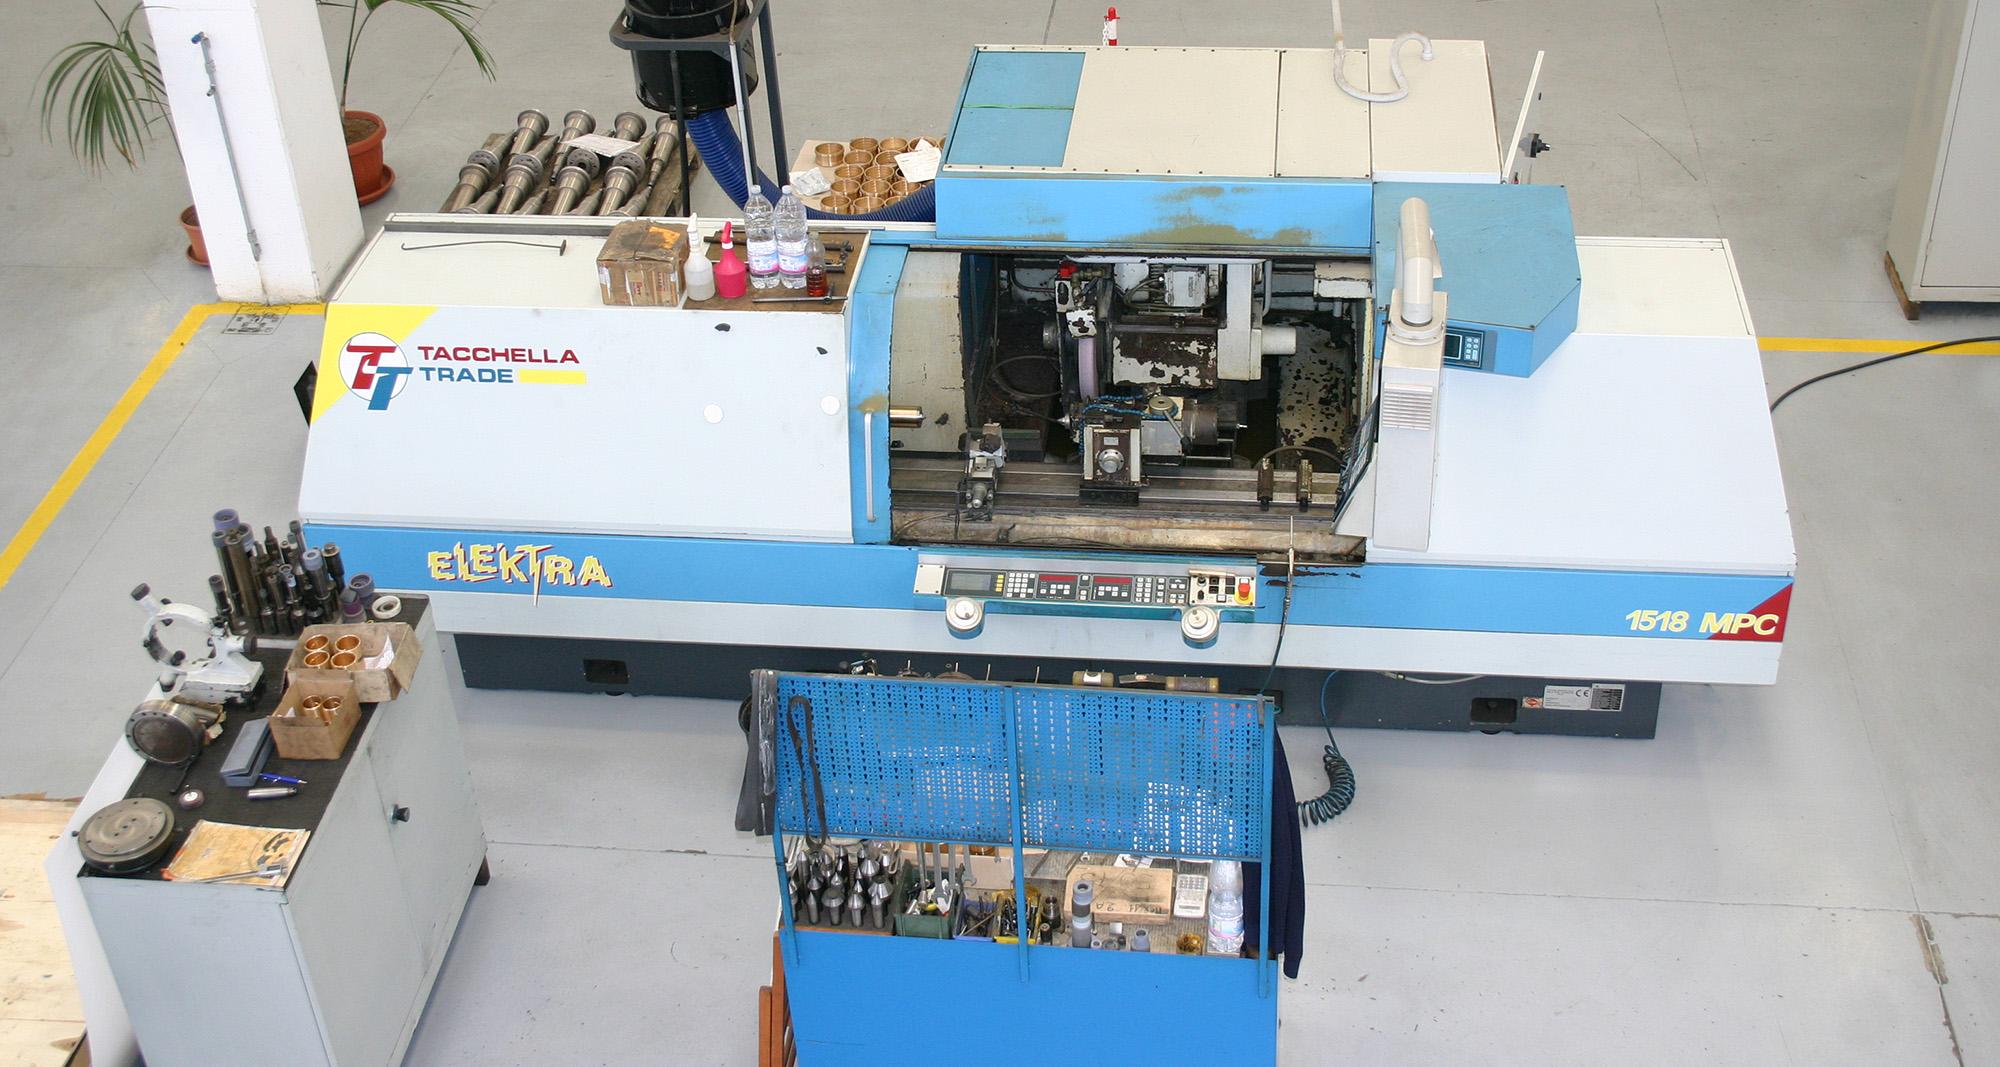 Tacchella Electra 1518 MPC